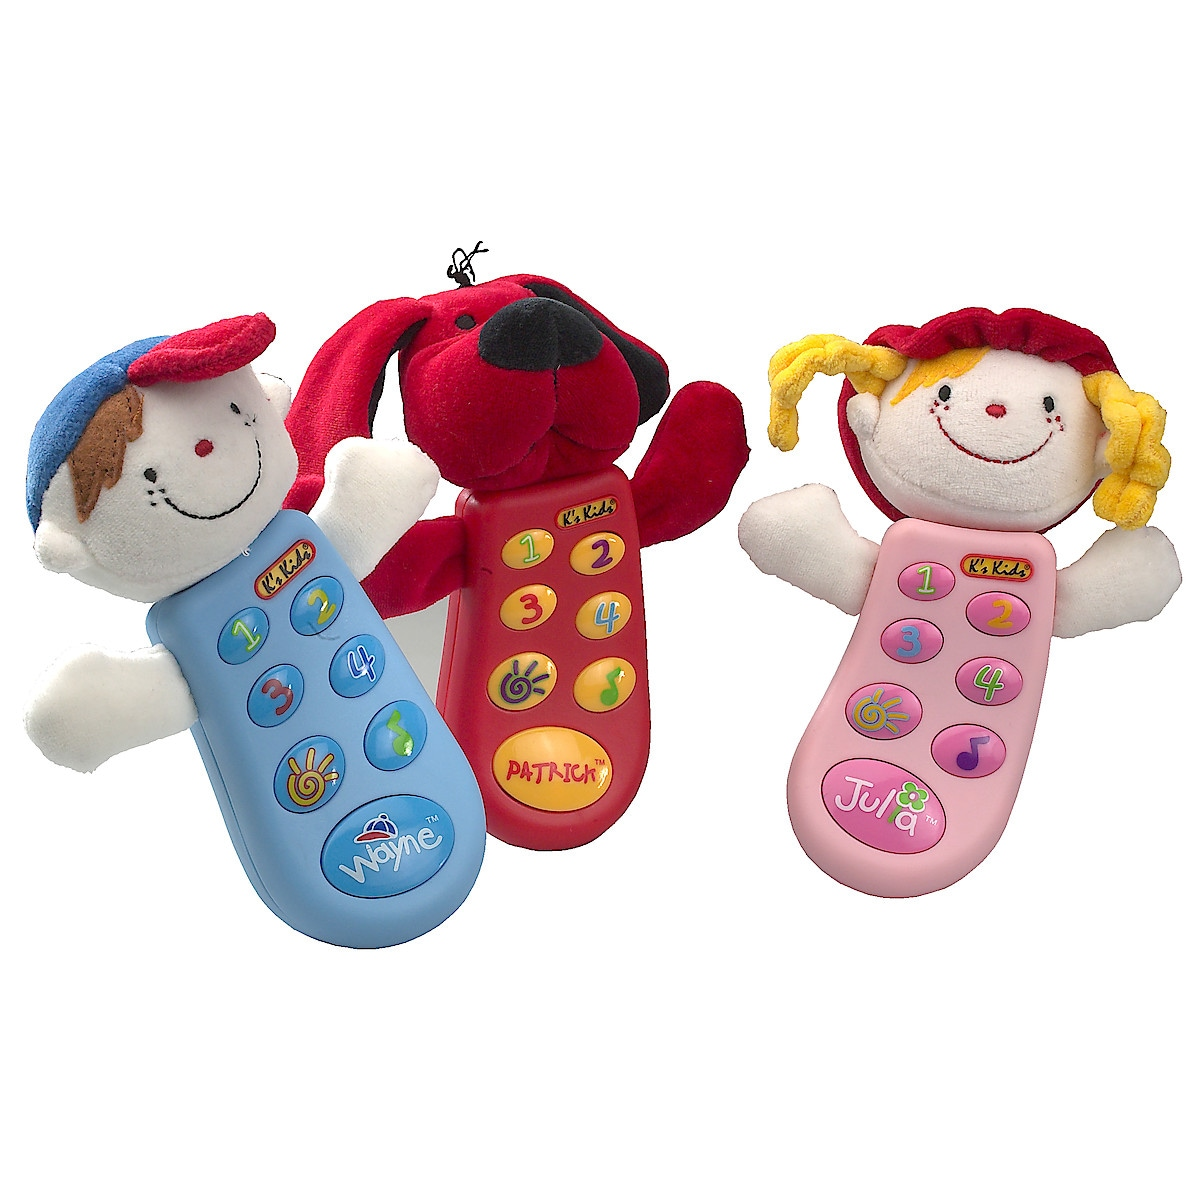 Babytelefon K's Kids